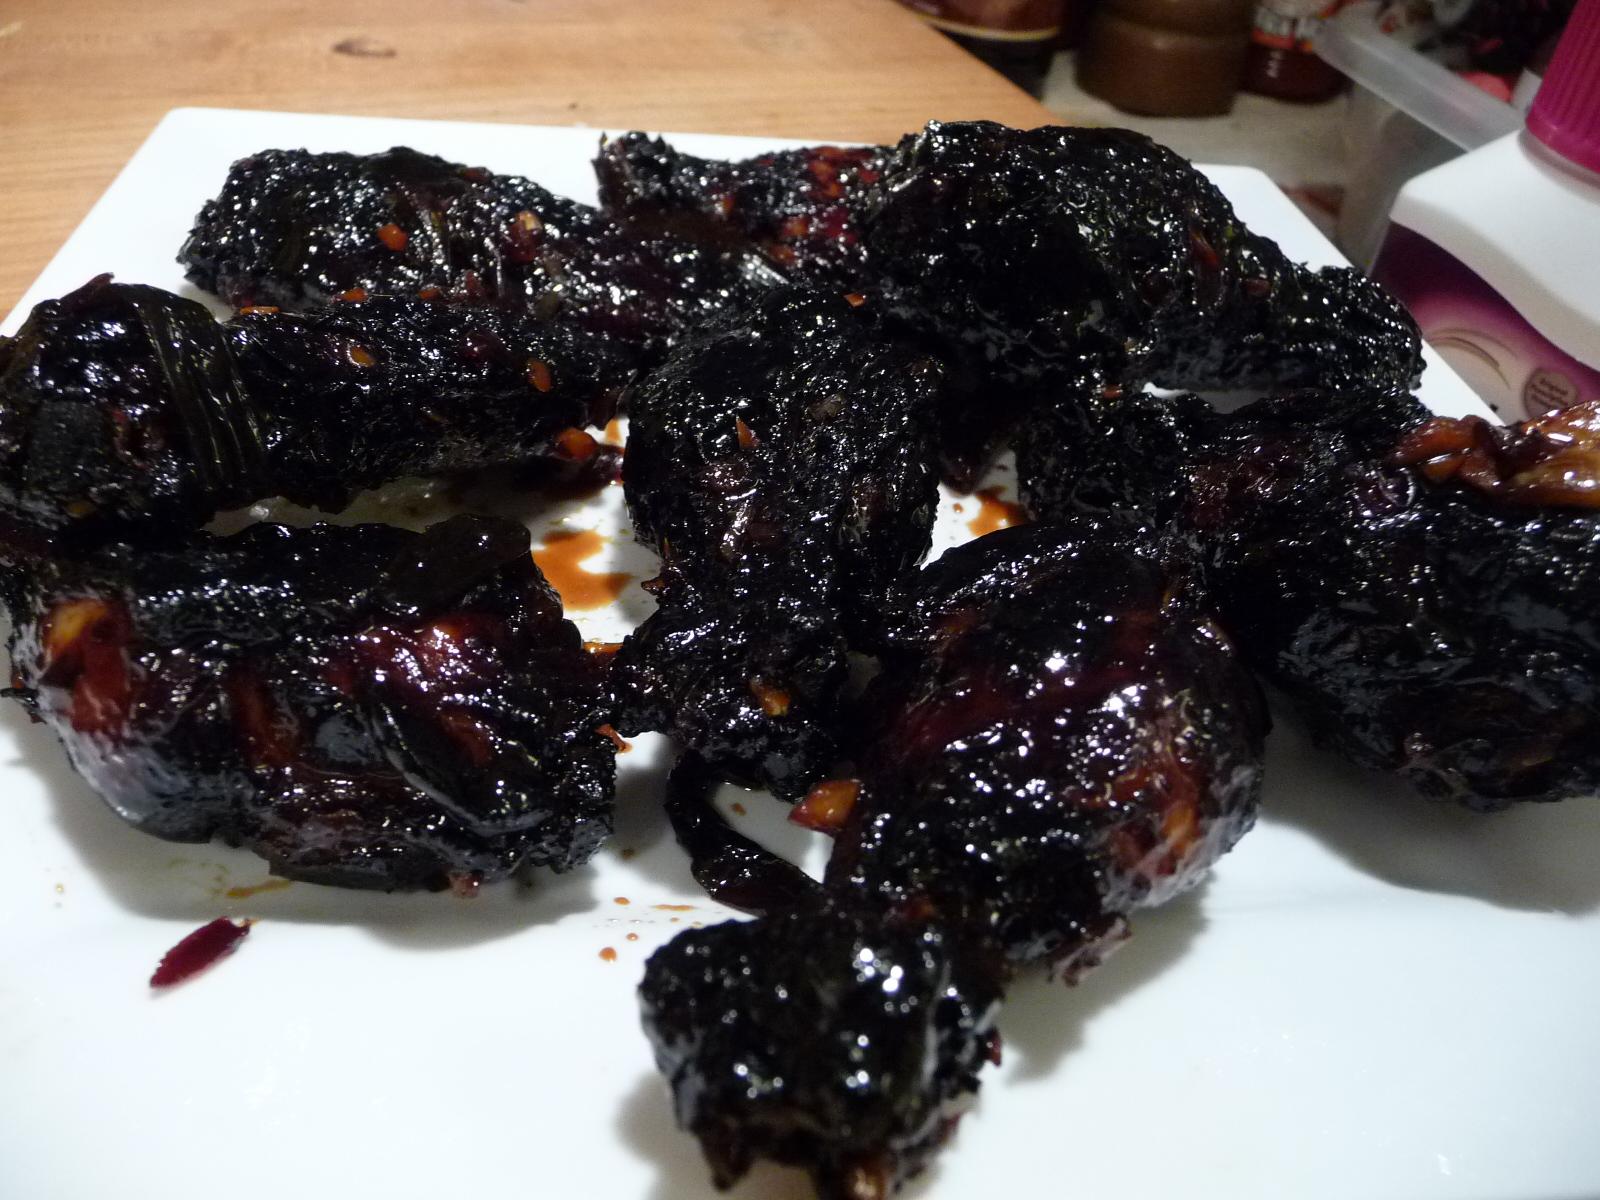 coal black wings sauced